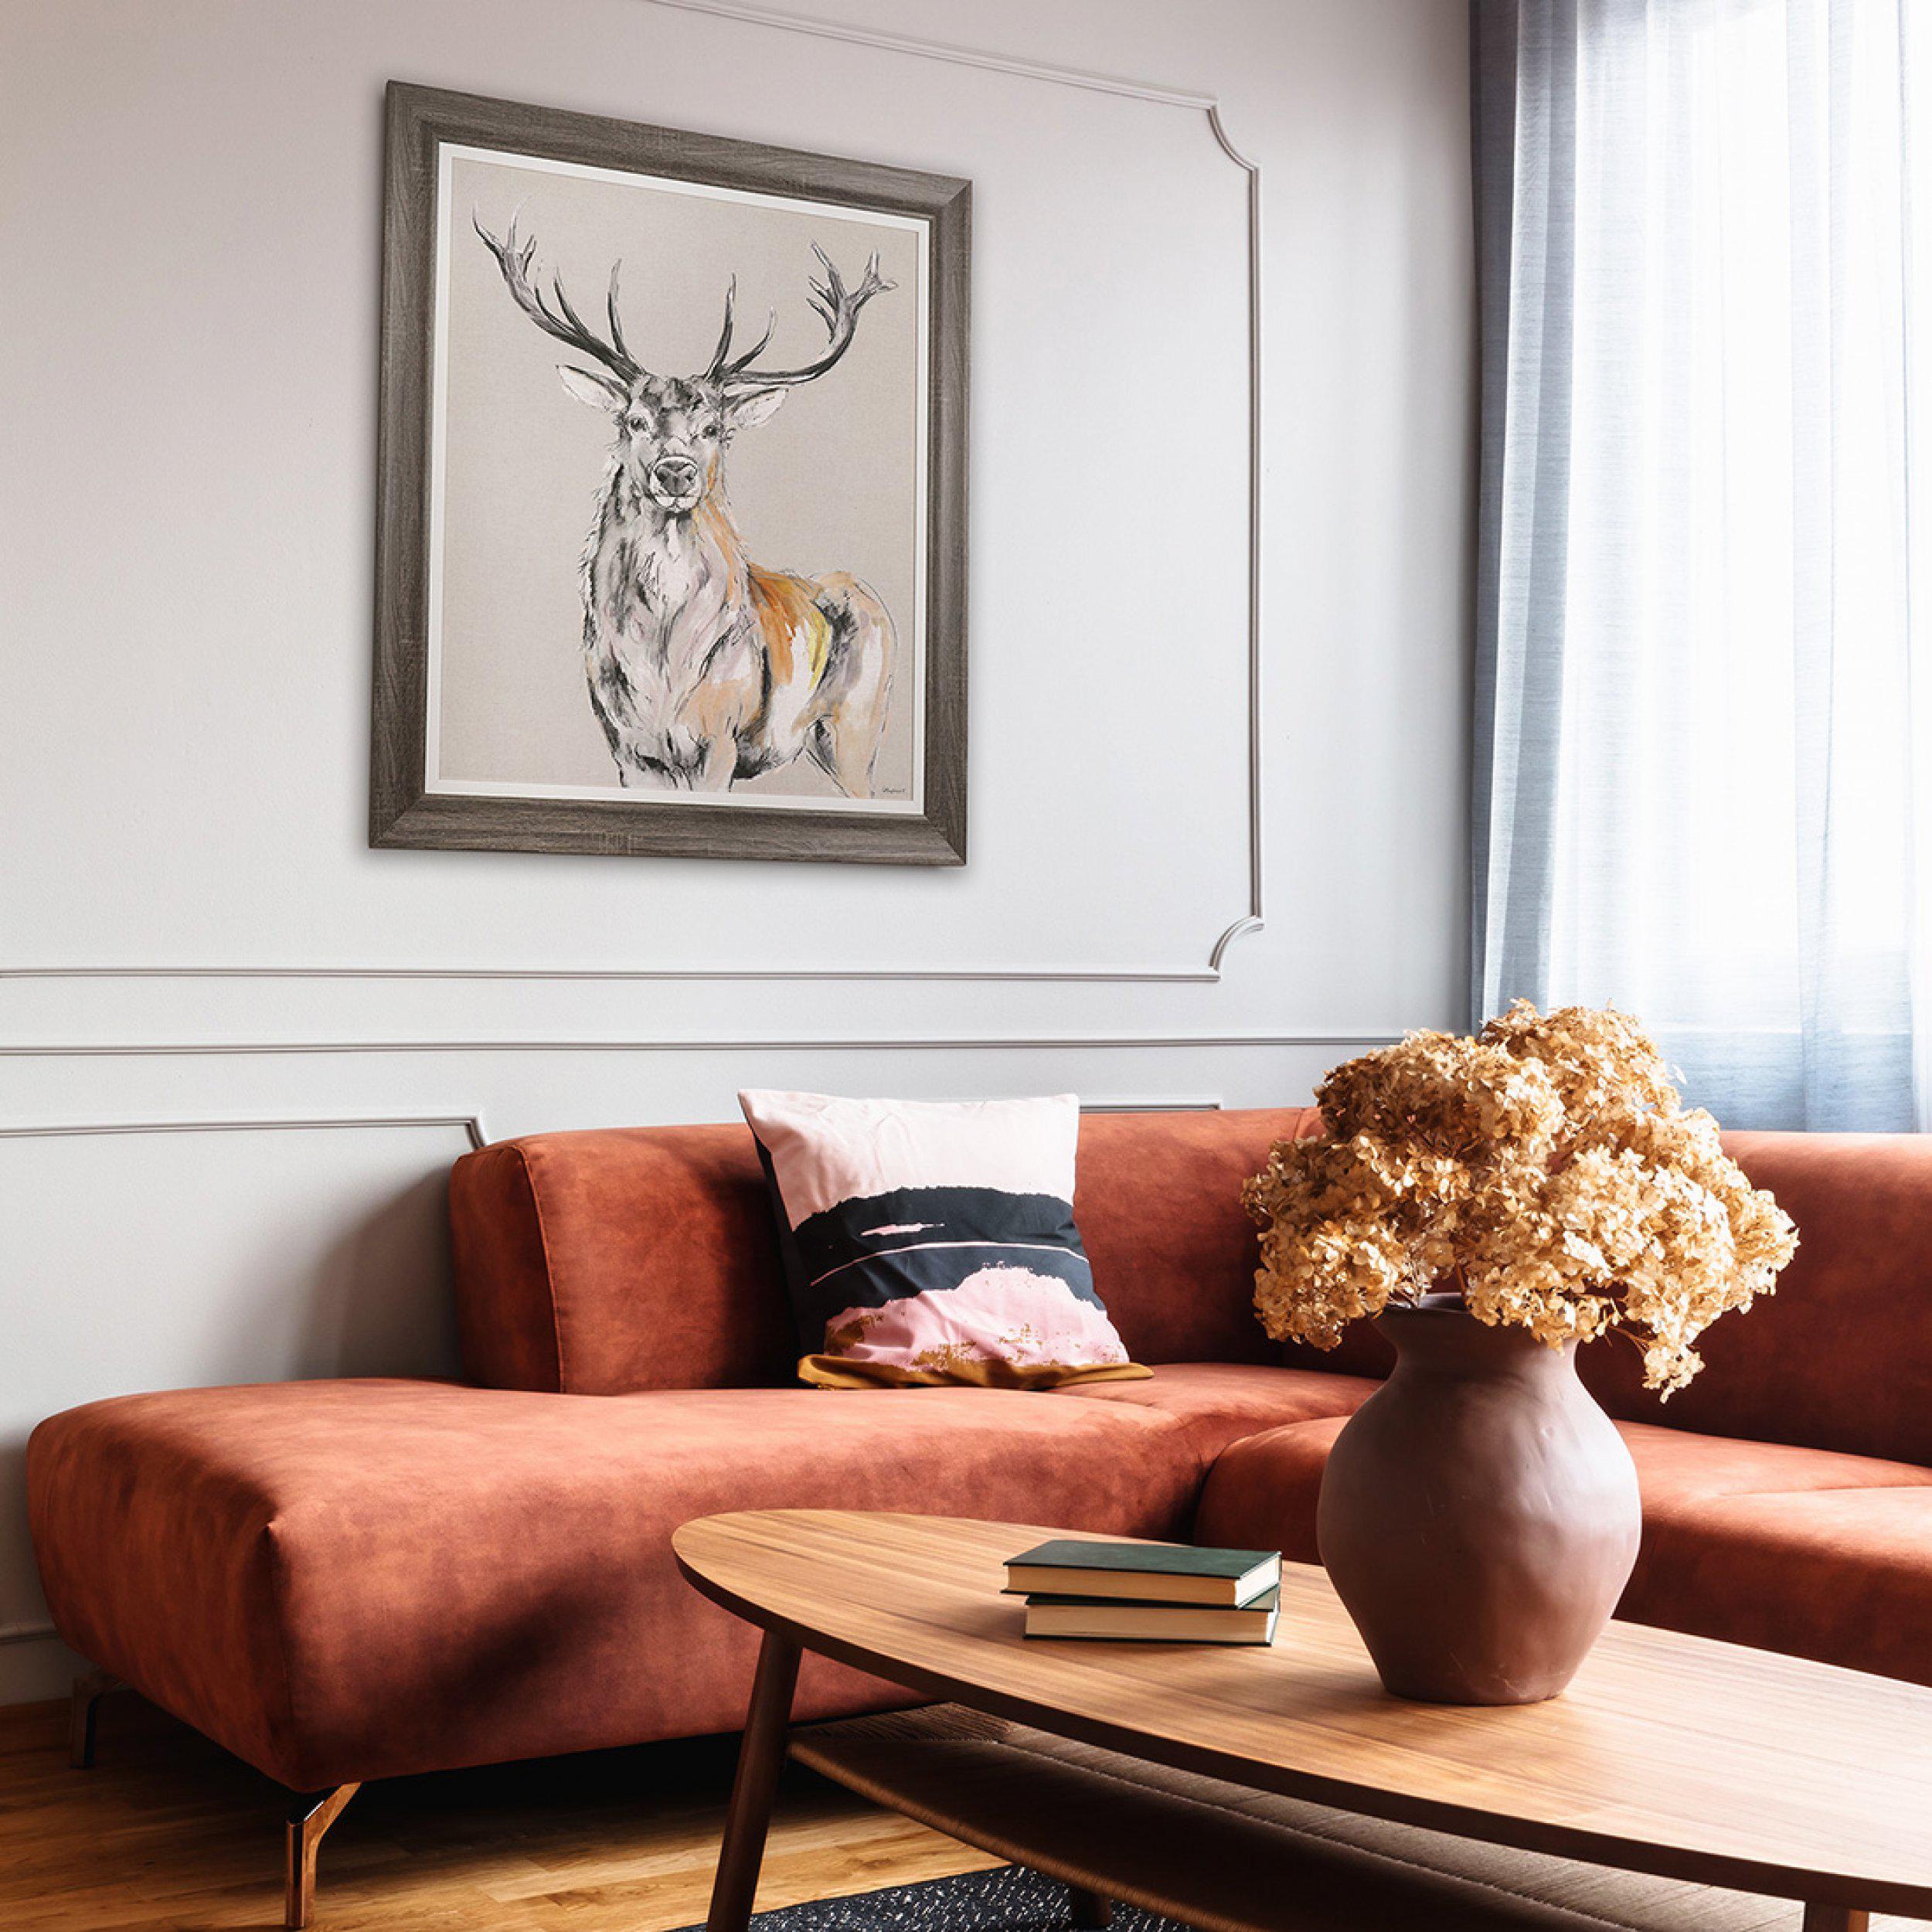 Art Gallery - Stag Standing Proud Painting by Artist Gracie Tapner - Framed Print For Sale - Room Display